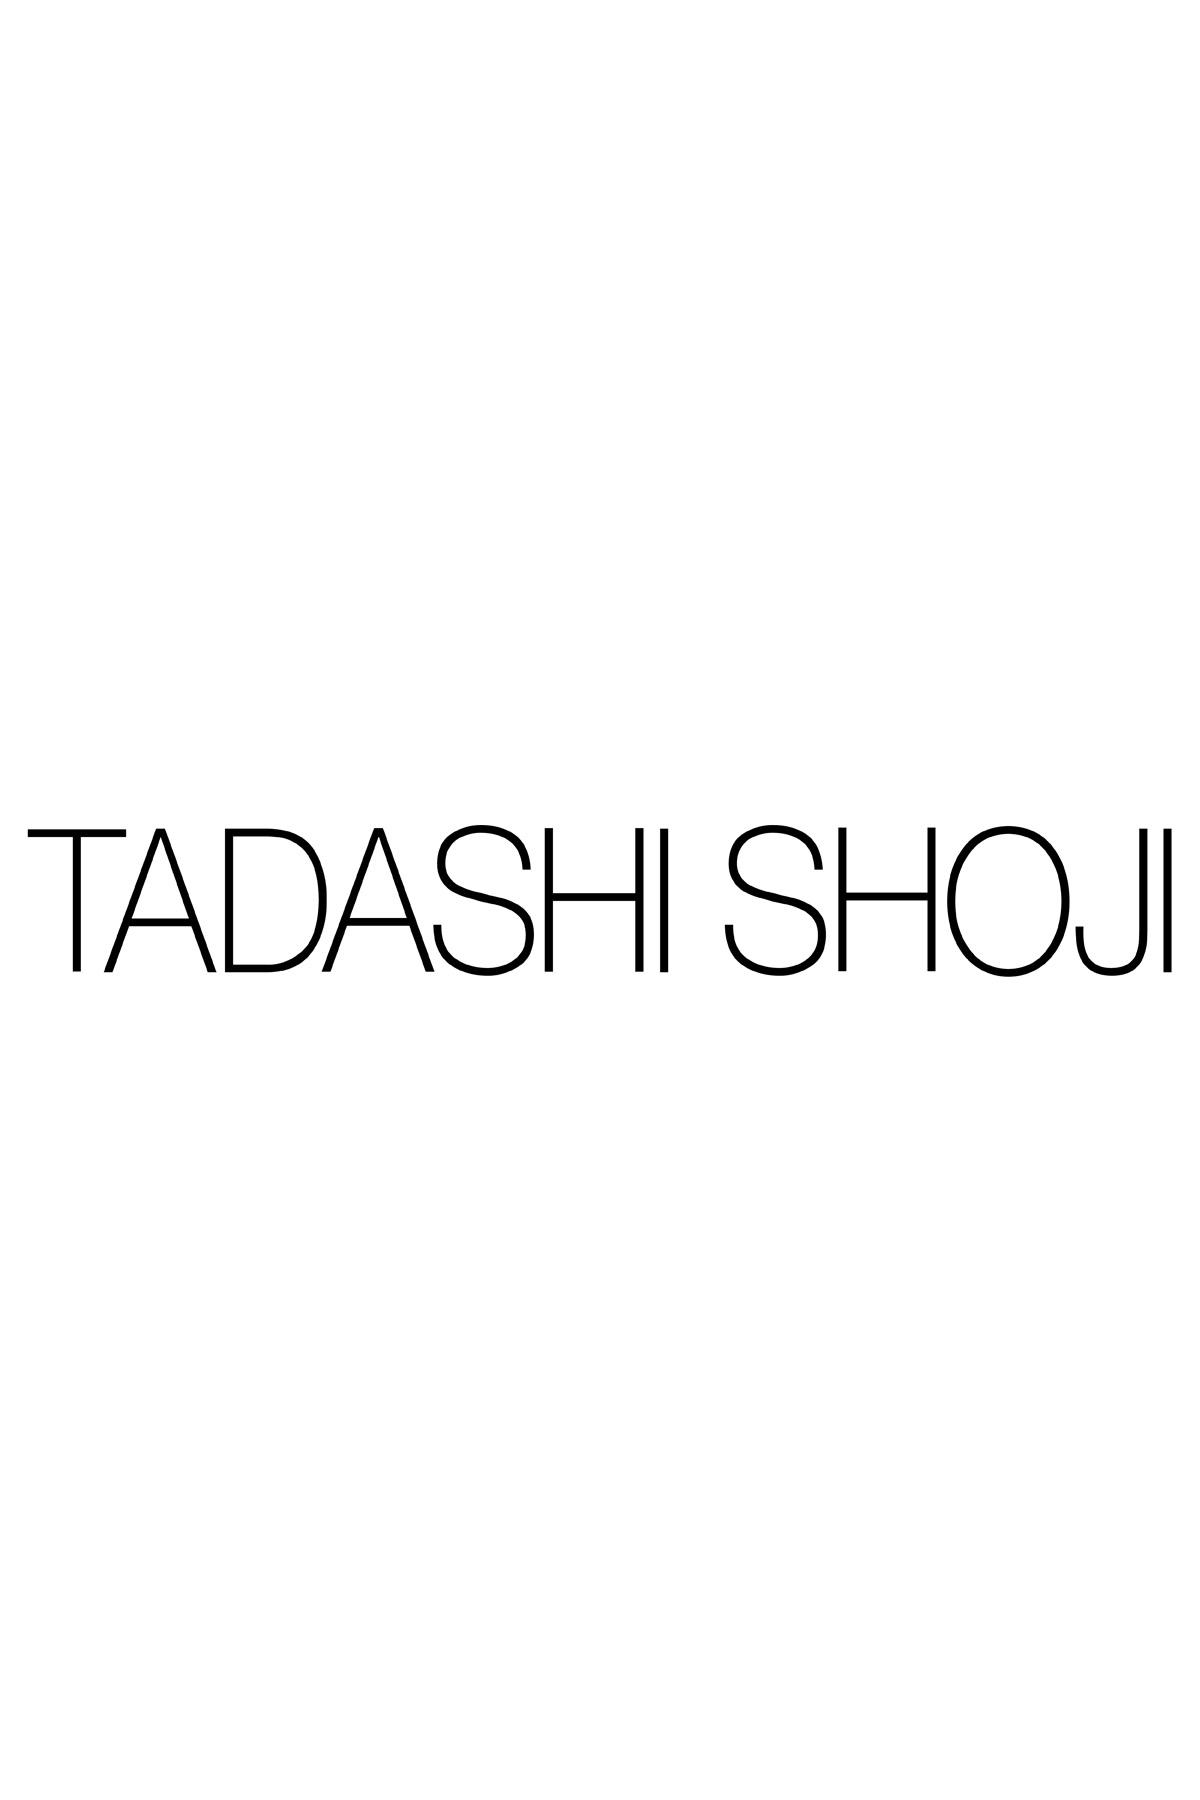 Tadashi Shoji - Koa Floral Embroidered Crepe Blouse - PLUS SIZE